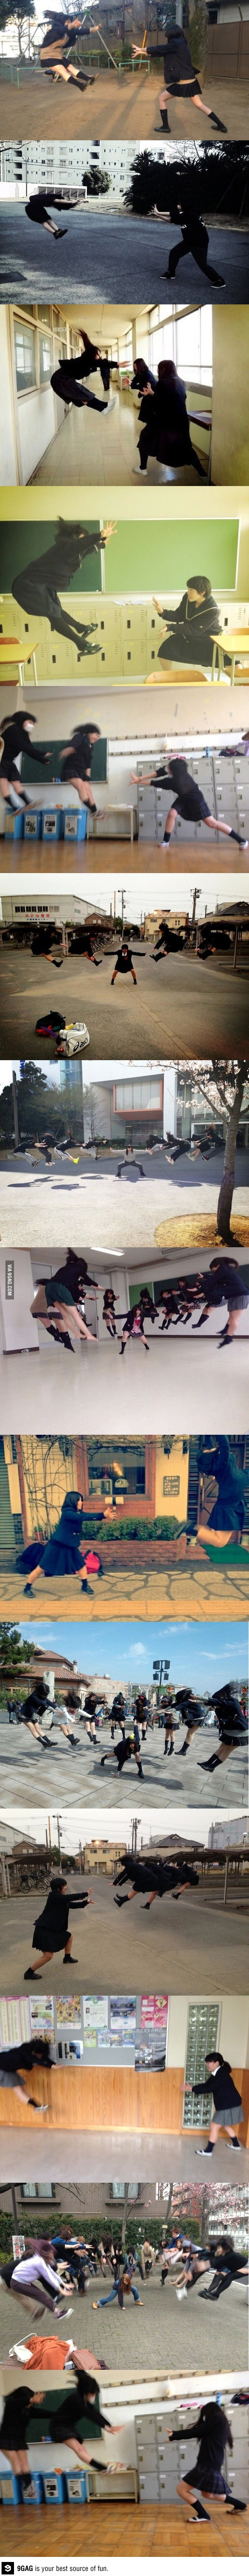 New japanese schoolgirls hobby Umm it reminds me of Dragon Ball Z lol